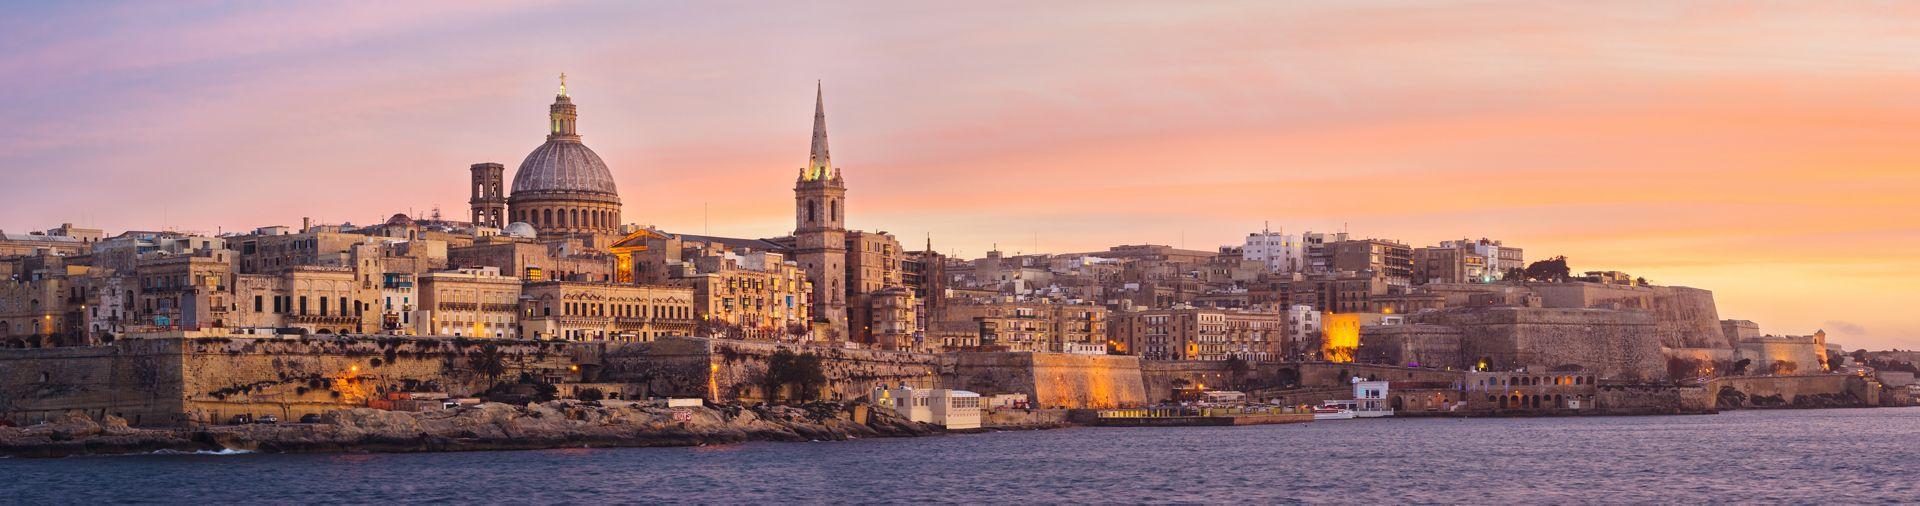 Silversea Luxury Cruises - Grand Voyage Med 2020